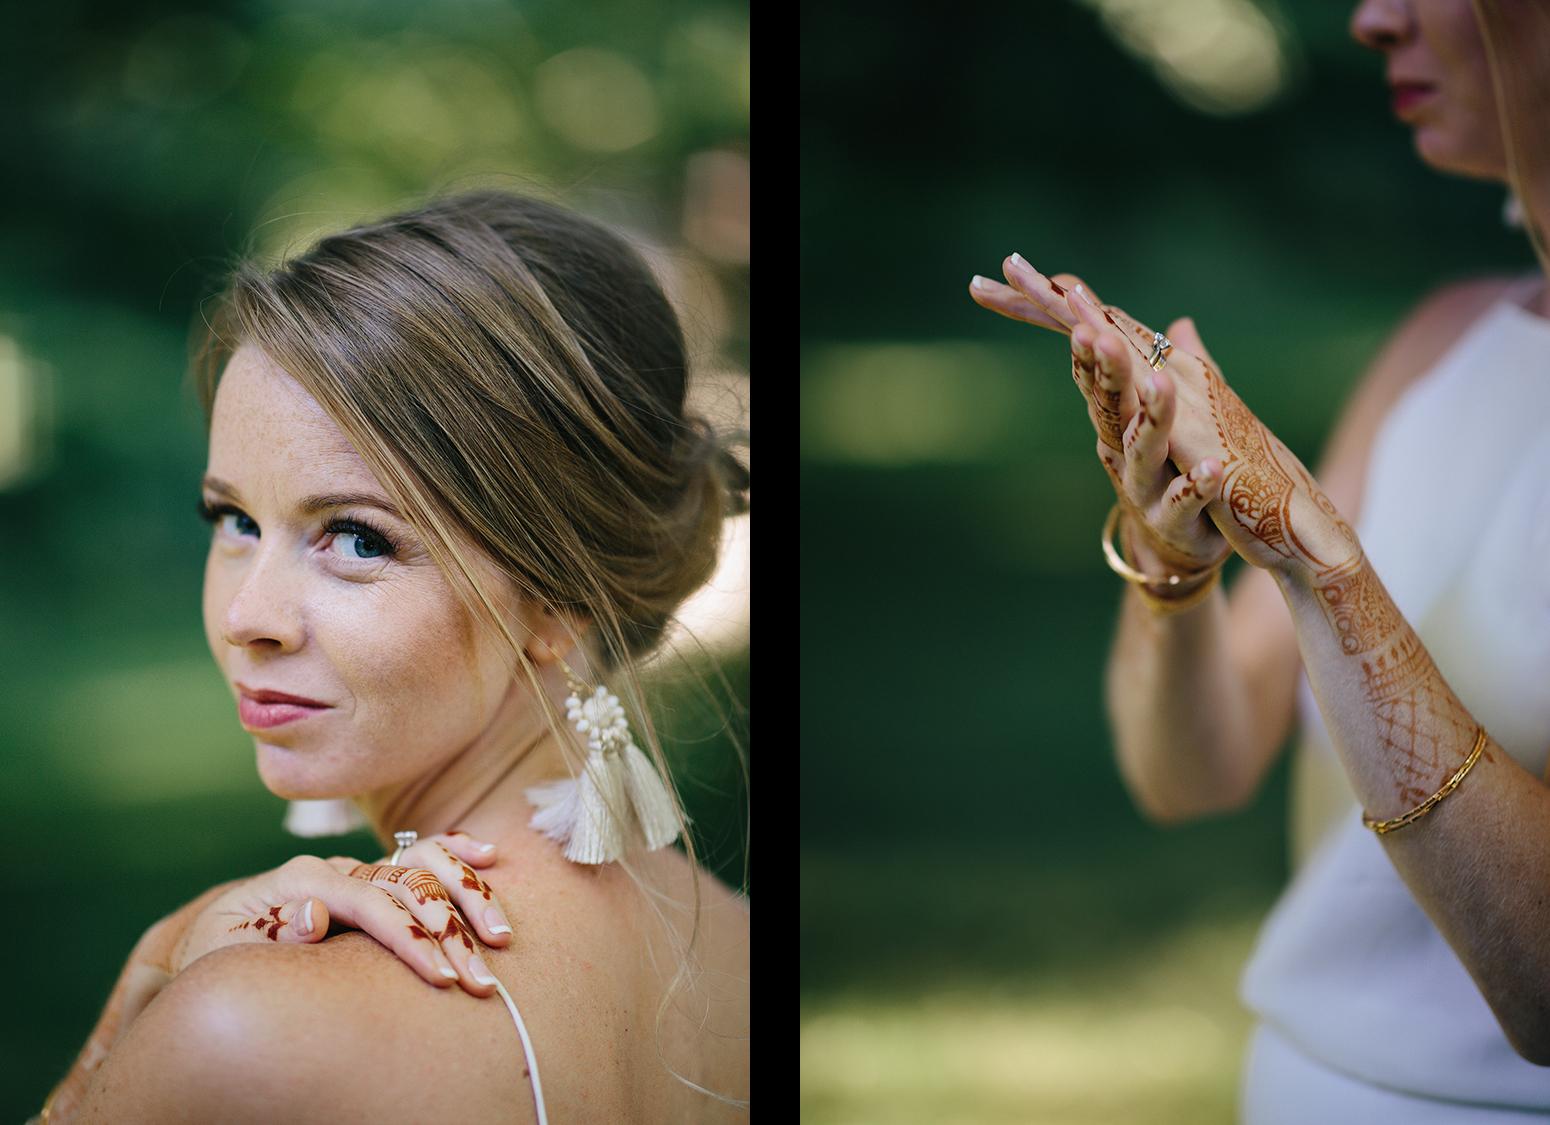 spread16-Wedding-Photographers-Toronto-Kodak-Trix-35mm-Photography-Ontario-Canada-wedding-couple-candid-portraits-intimate-documentary-fine-art-aesthetic-lifestyle-bridal-portrait-fashion-editorial-portraiture-unique-stunning-blue-eye.jpg